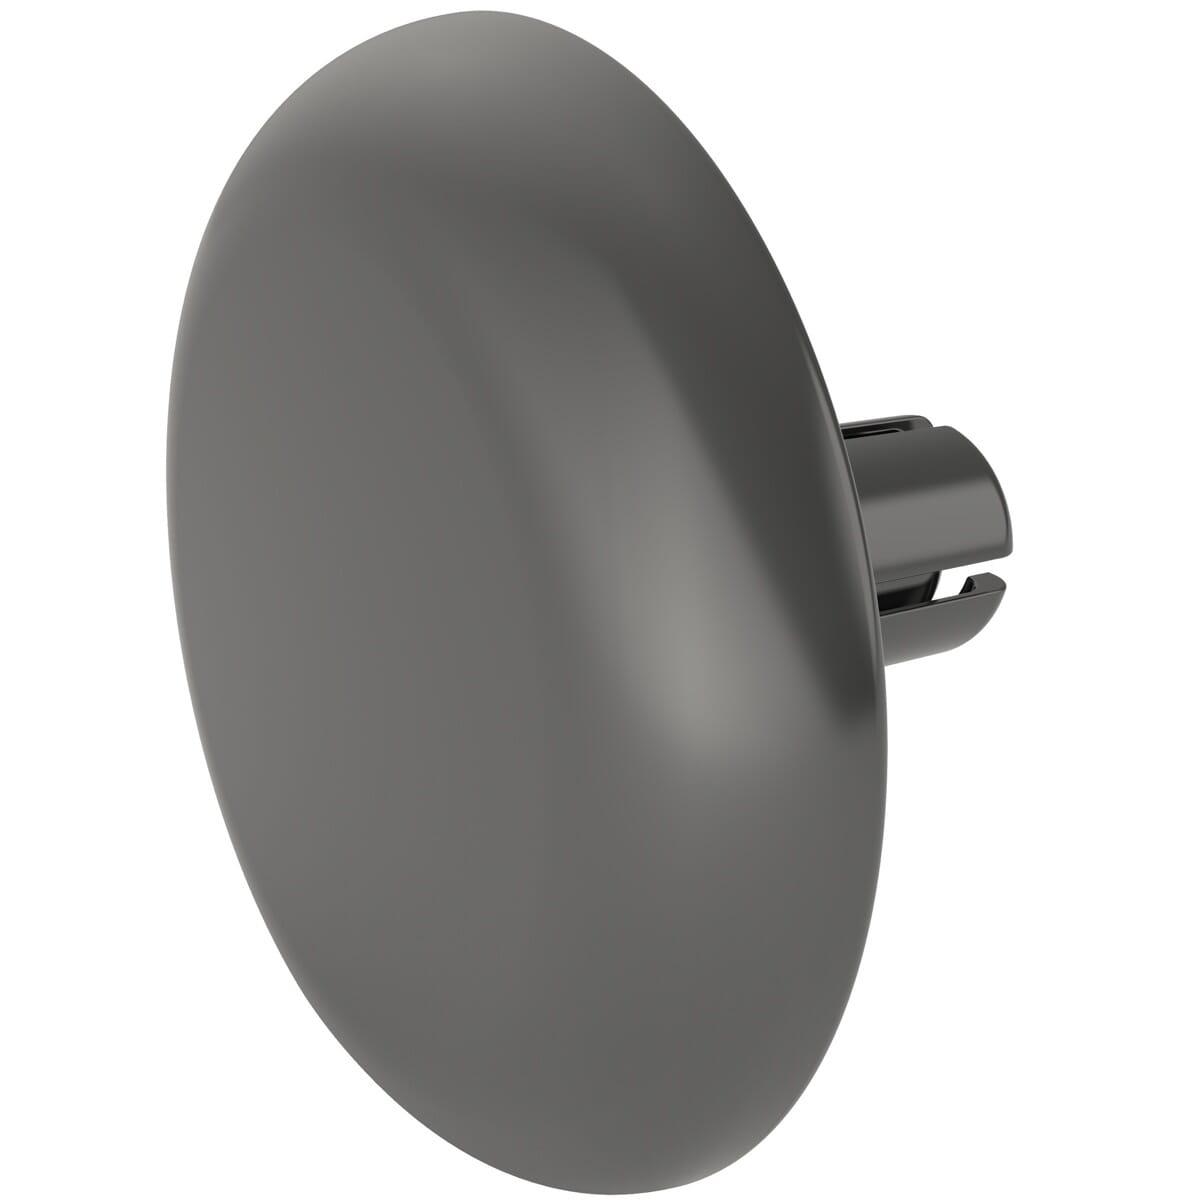 3.1-3.2mm x 5.5mm Snap Rivet P-Type - Black Polysulfone